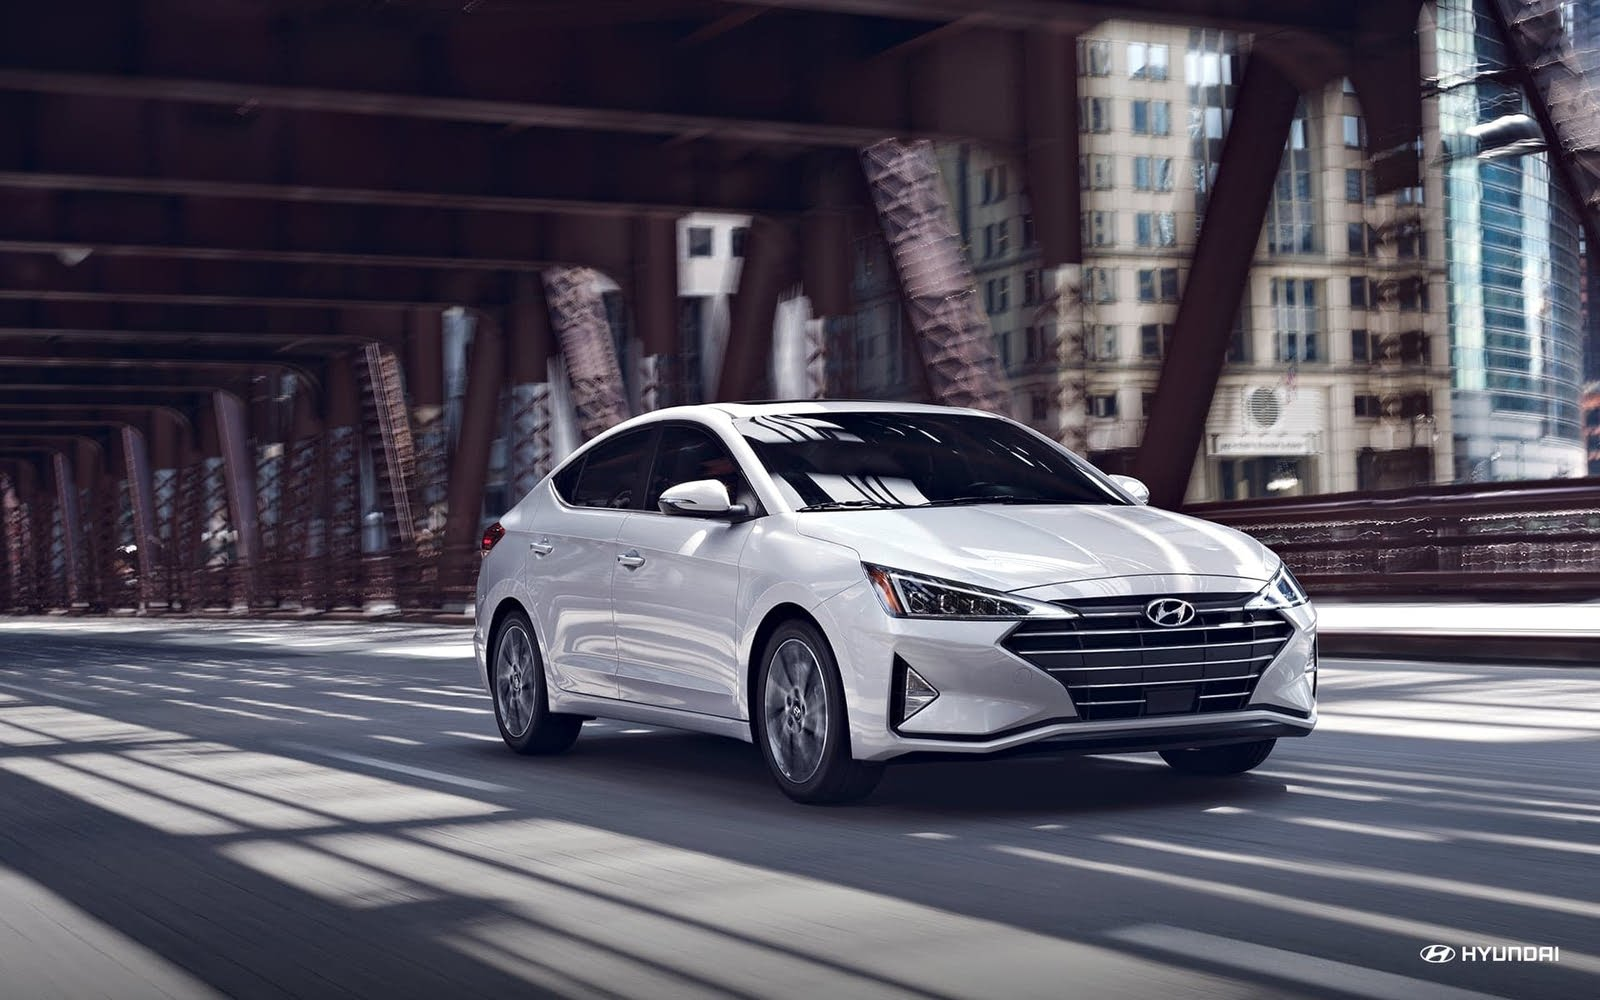 2019 Hyundai Elantra Overview Cargurus